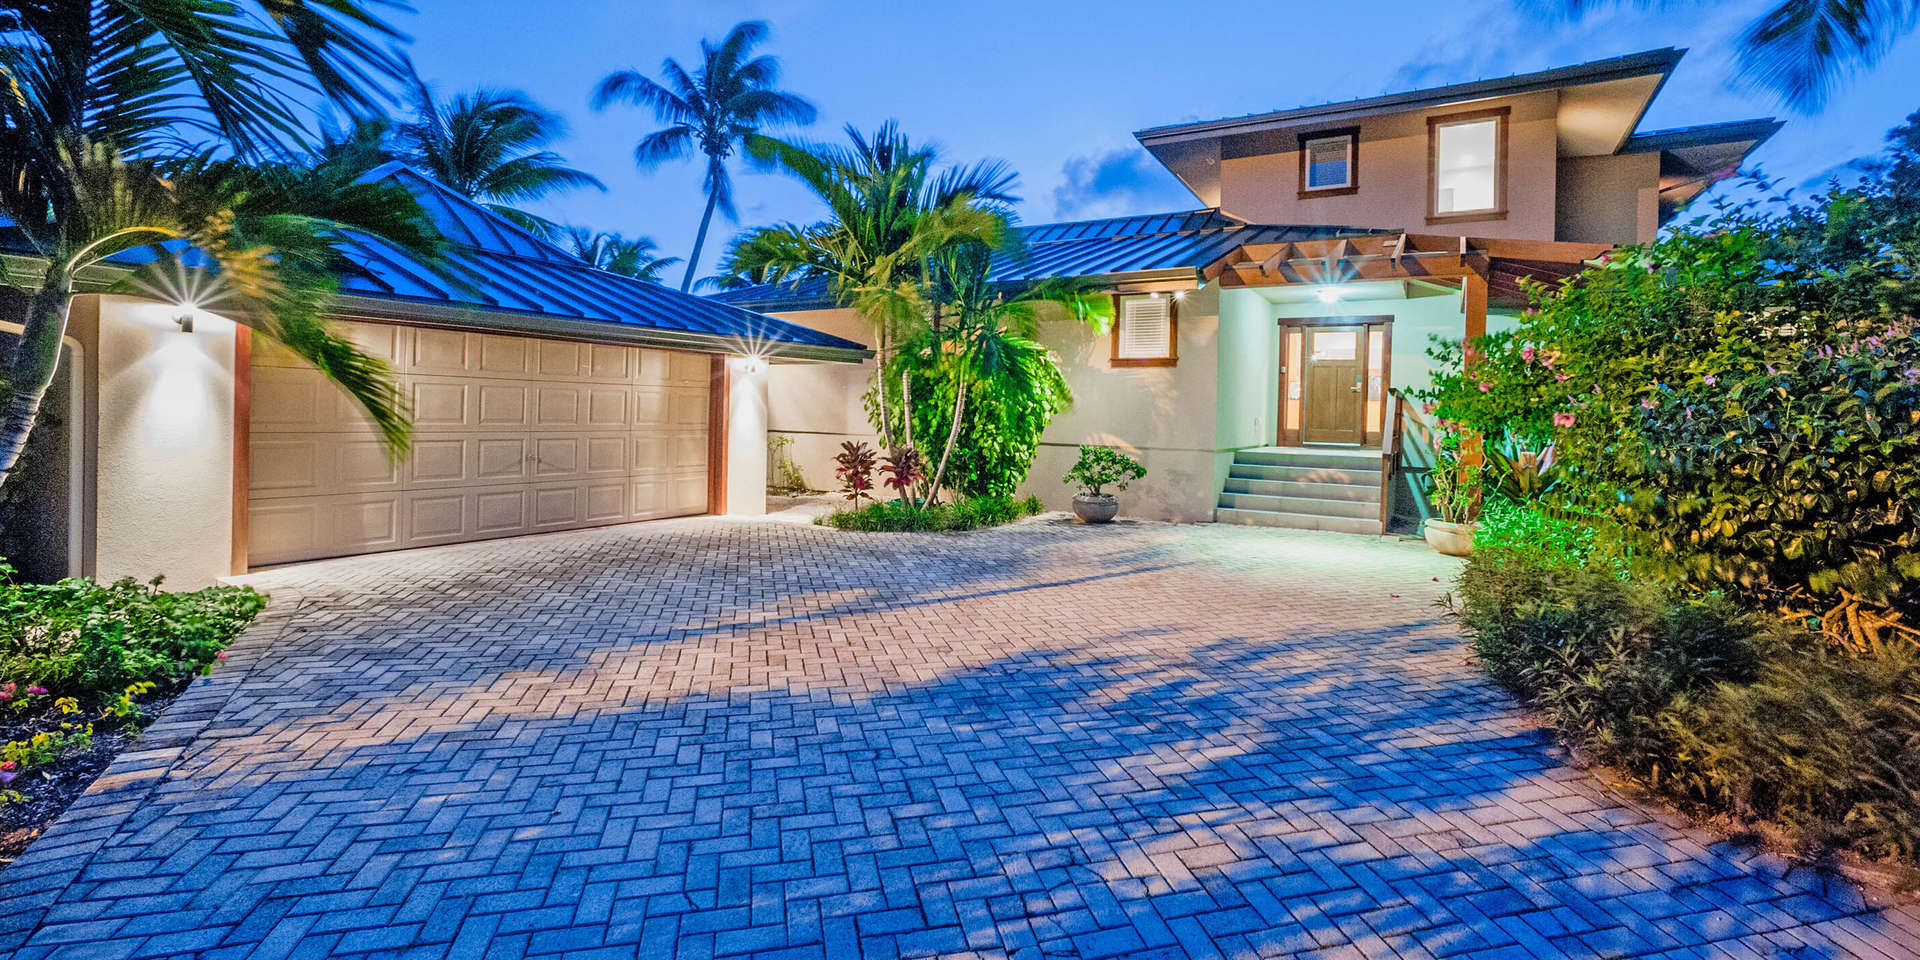 Luxury villa rentals caribbean - Cayman islands - Grand cayman - Rum point - Tarasand - Image 1/14